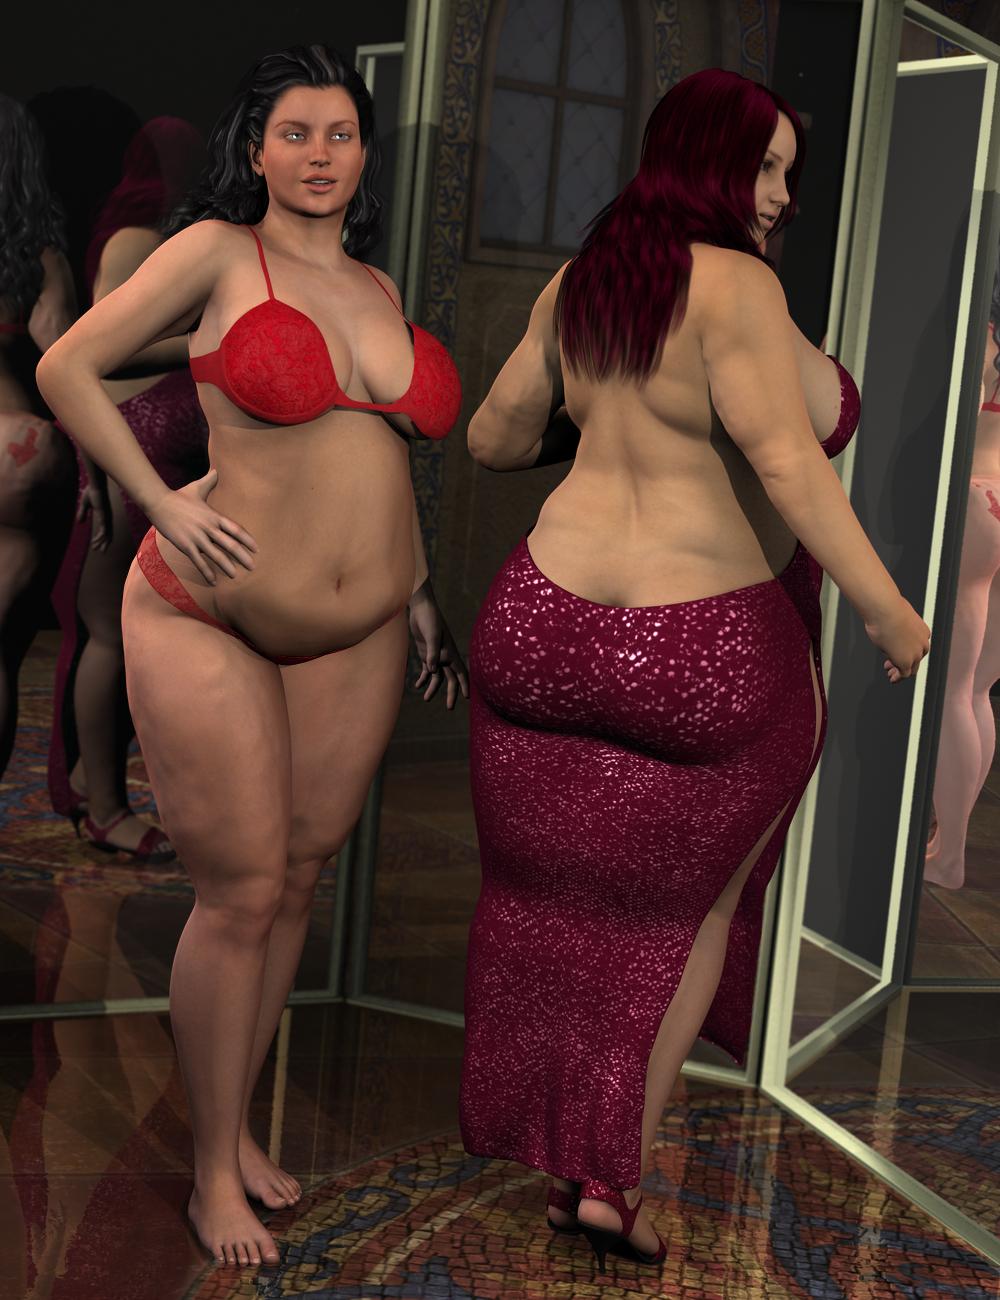 Big Beautiful Genesis 2 Female(s) by: Sickleyield, 3D Models by Daz 3D